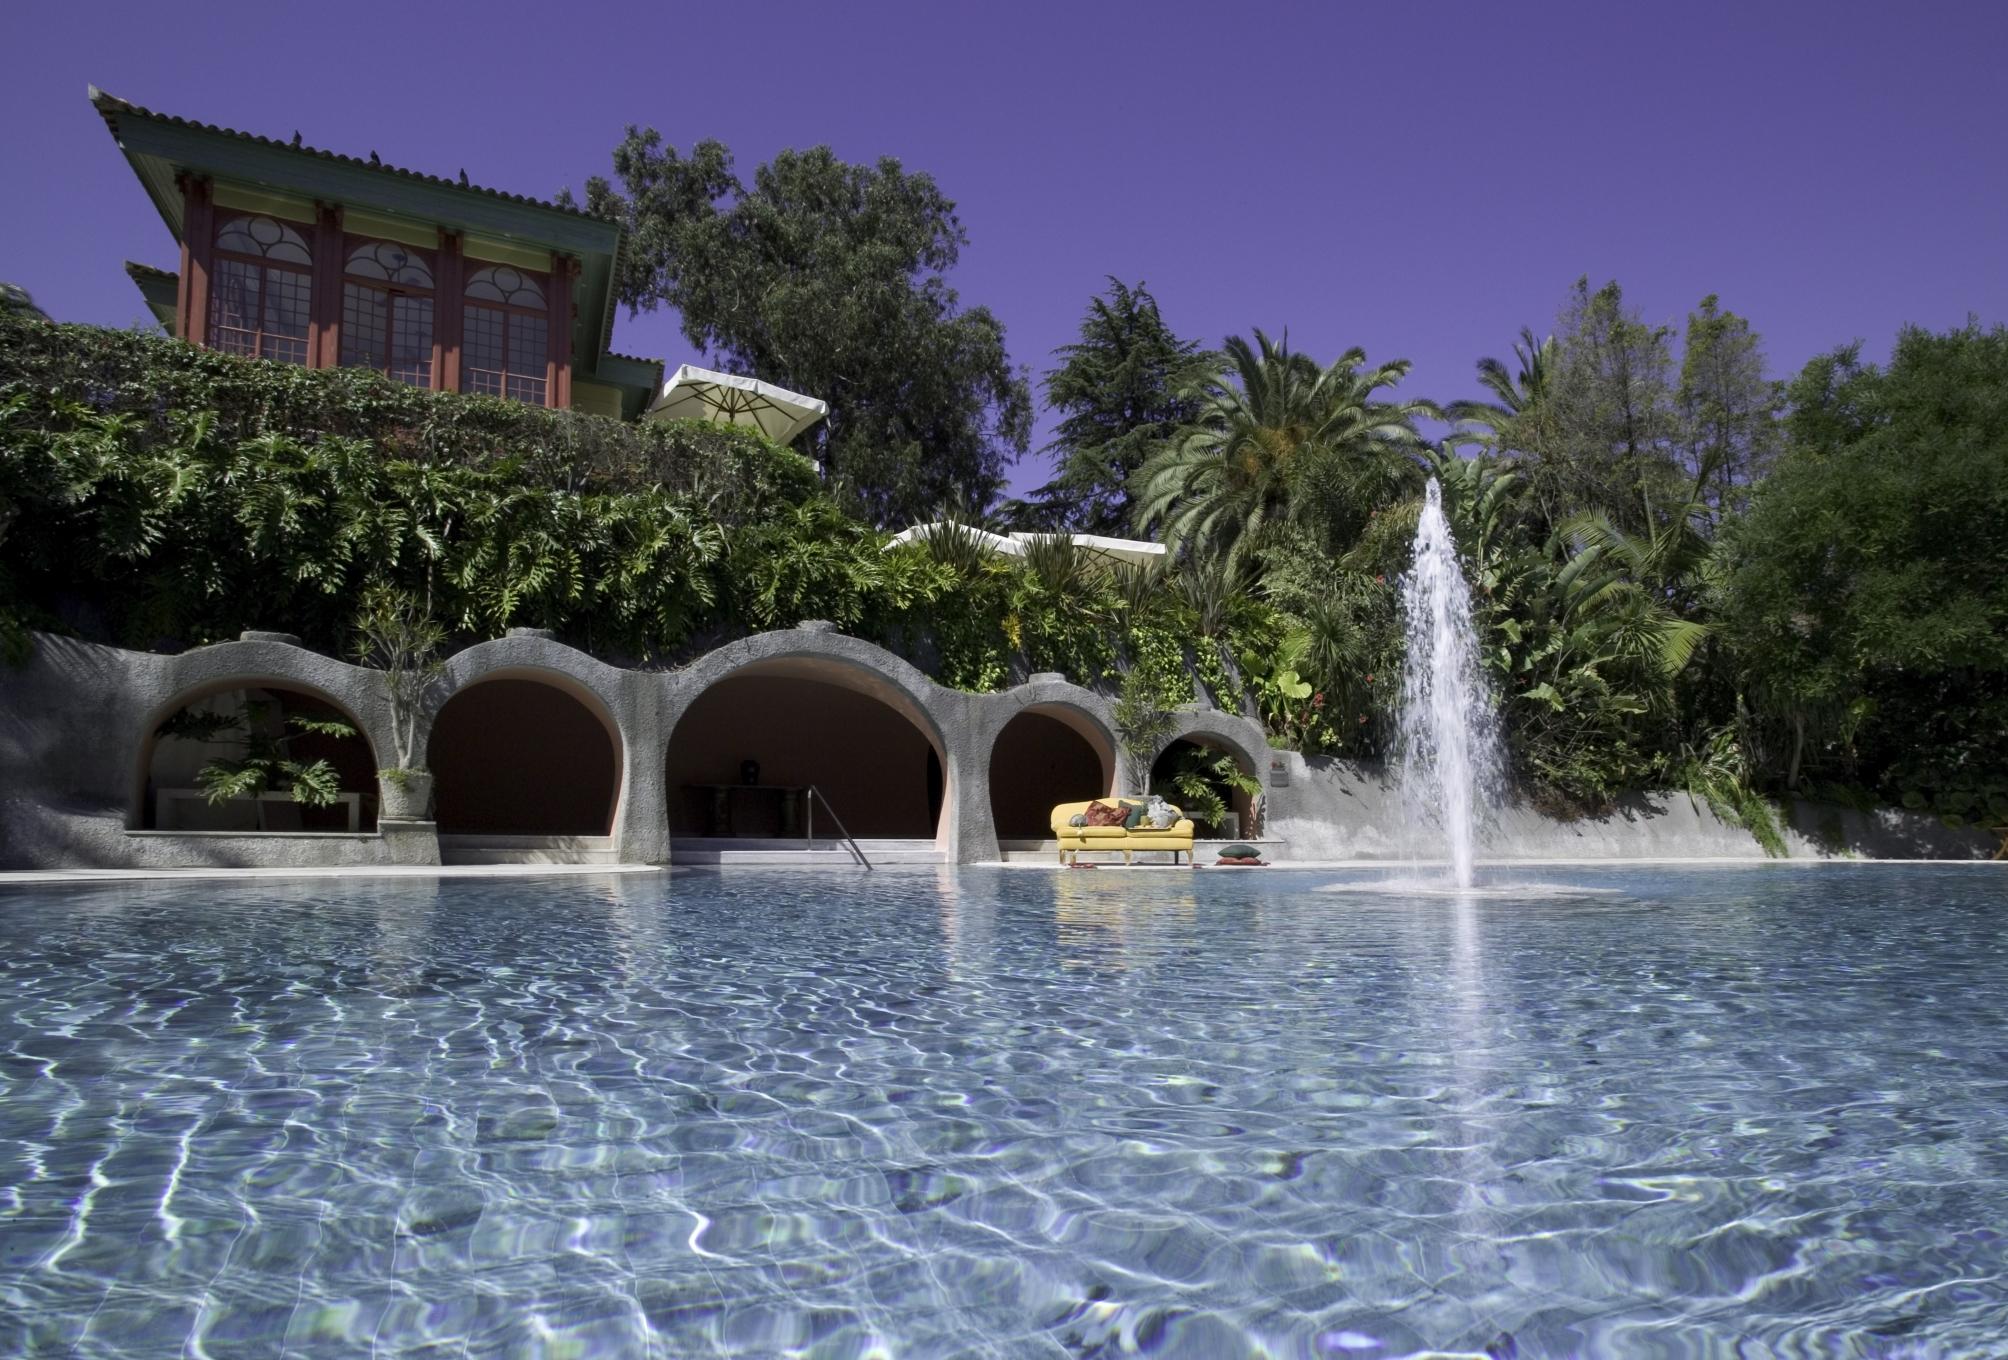 Hotel Pestana Palace Hotel National Monument en Lisboa desde